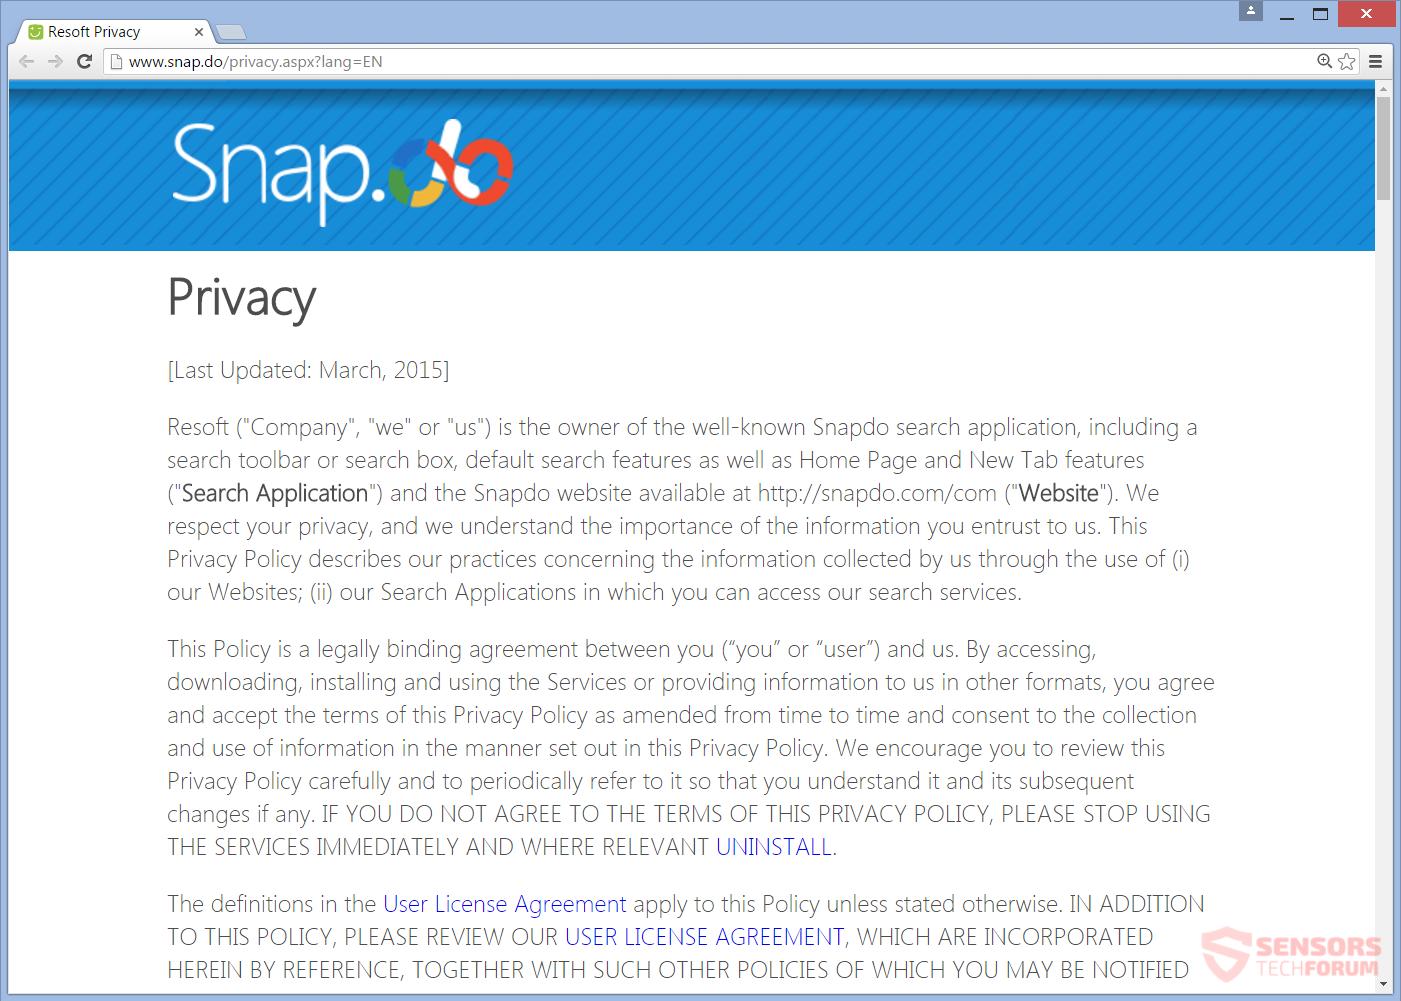 STF-trusted-surf-com-trustedsurf-browser-hijacker-snapdo-com-snap-do-privacy-policy